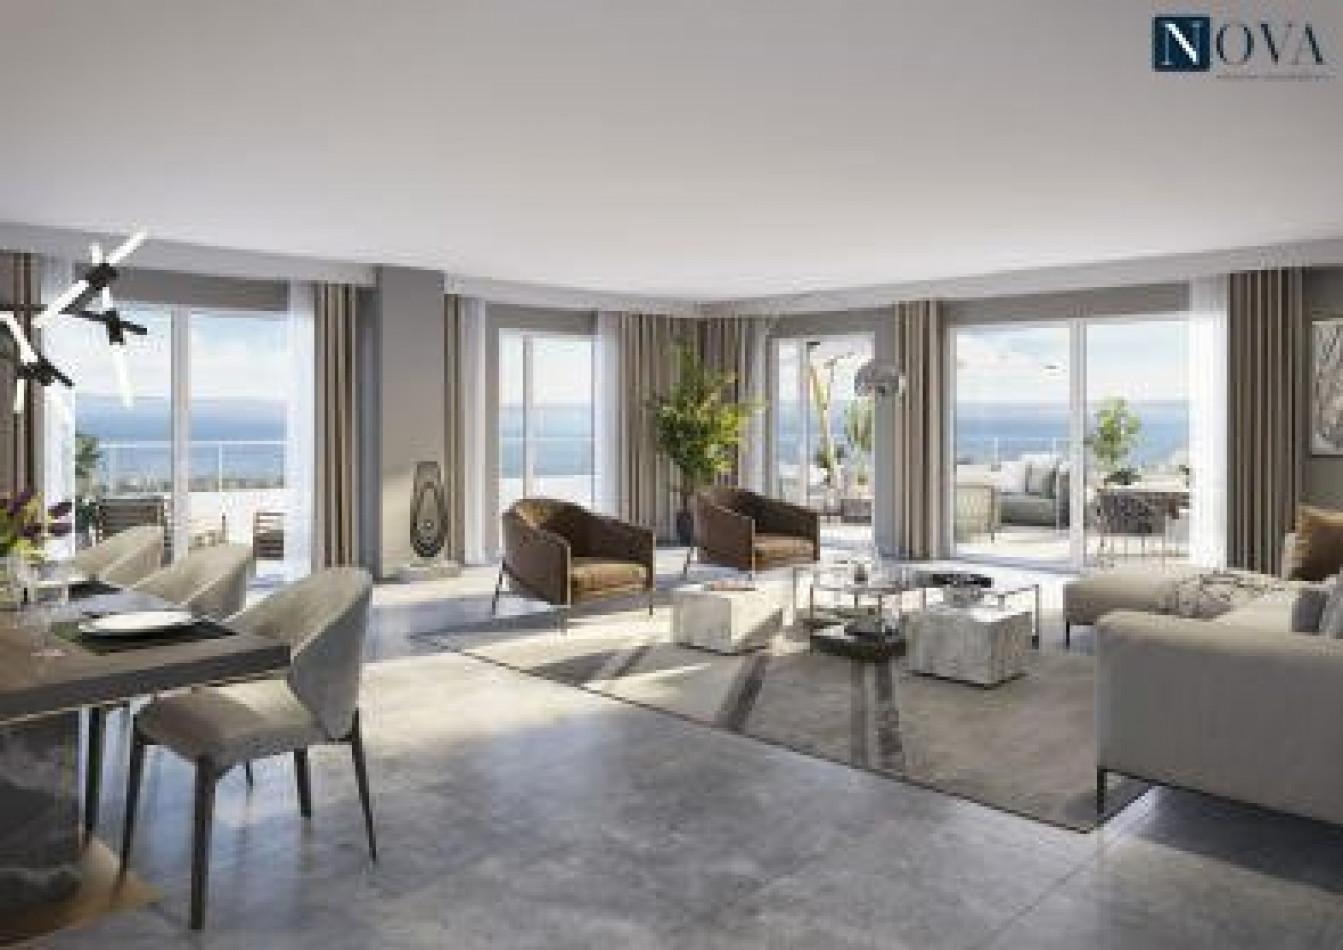 A vendre  Evian Les Bains | Réf 74029329 - Nova solutions immobilieres